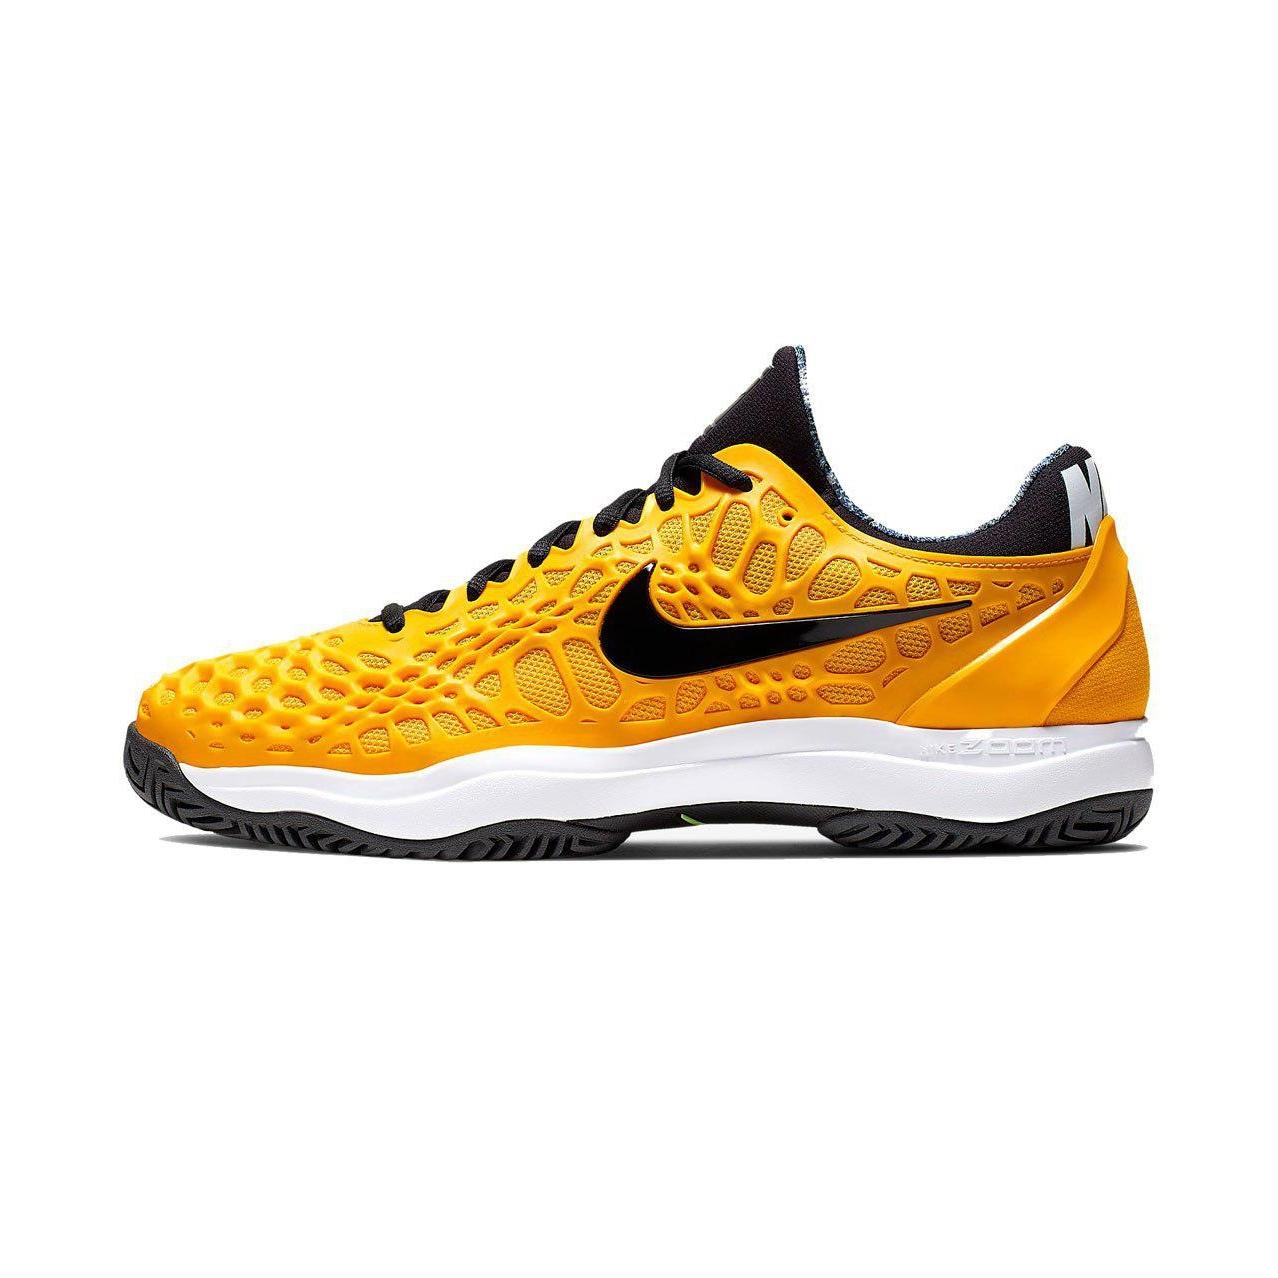 7f84cd46219 Nike Zoom Cage 3 Clay/Padel Orange. 13976 13972 13973 13975